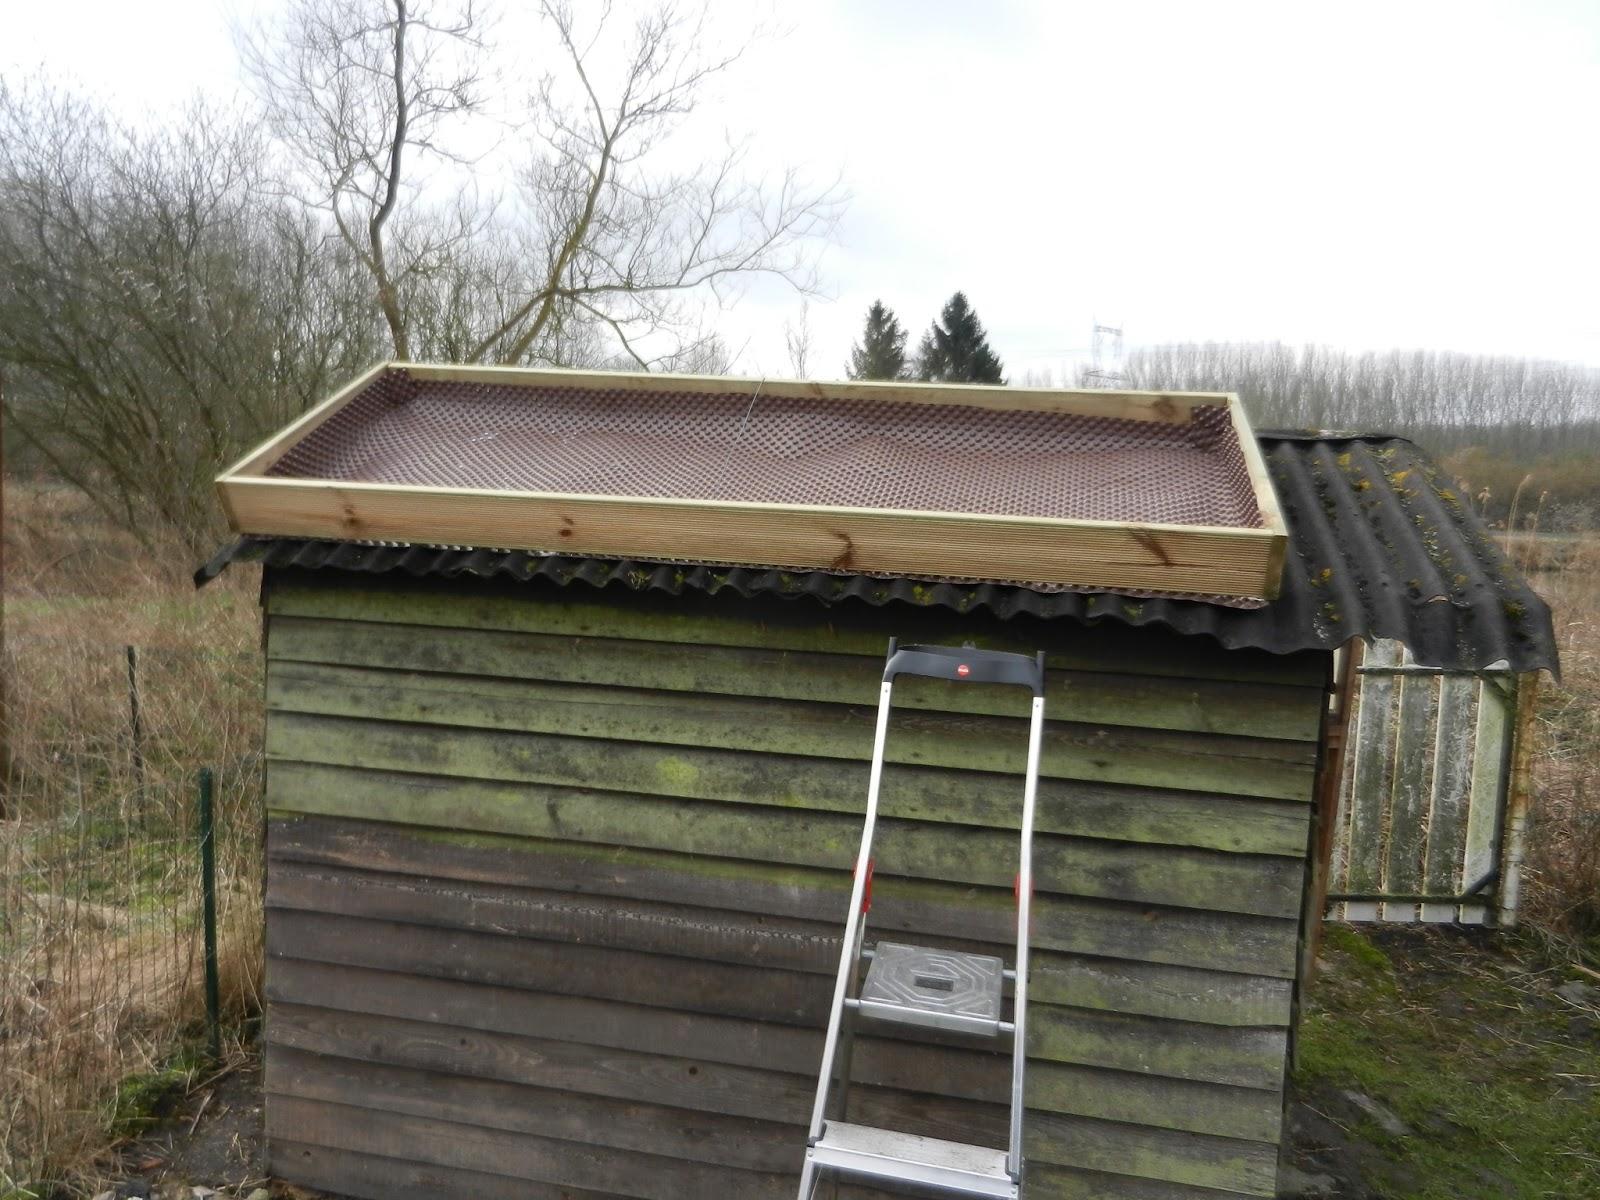 Mon toit v g tal beno t br milts - Cadre vegetal jardiland ...